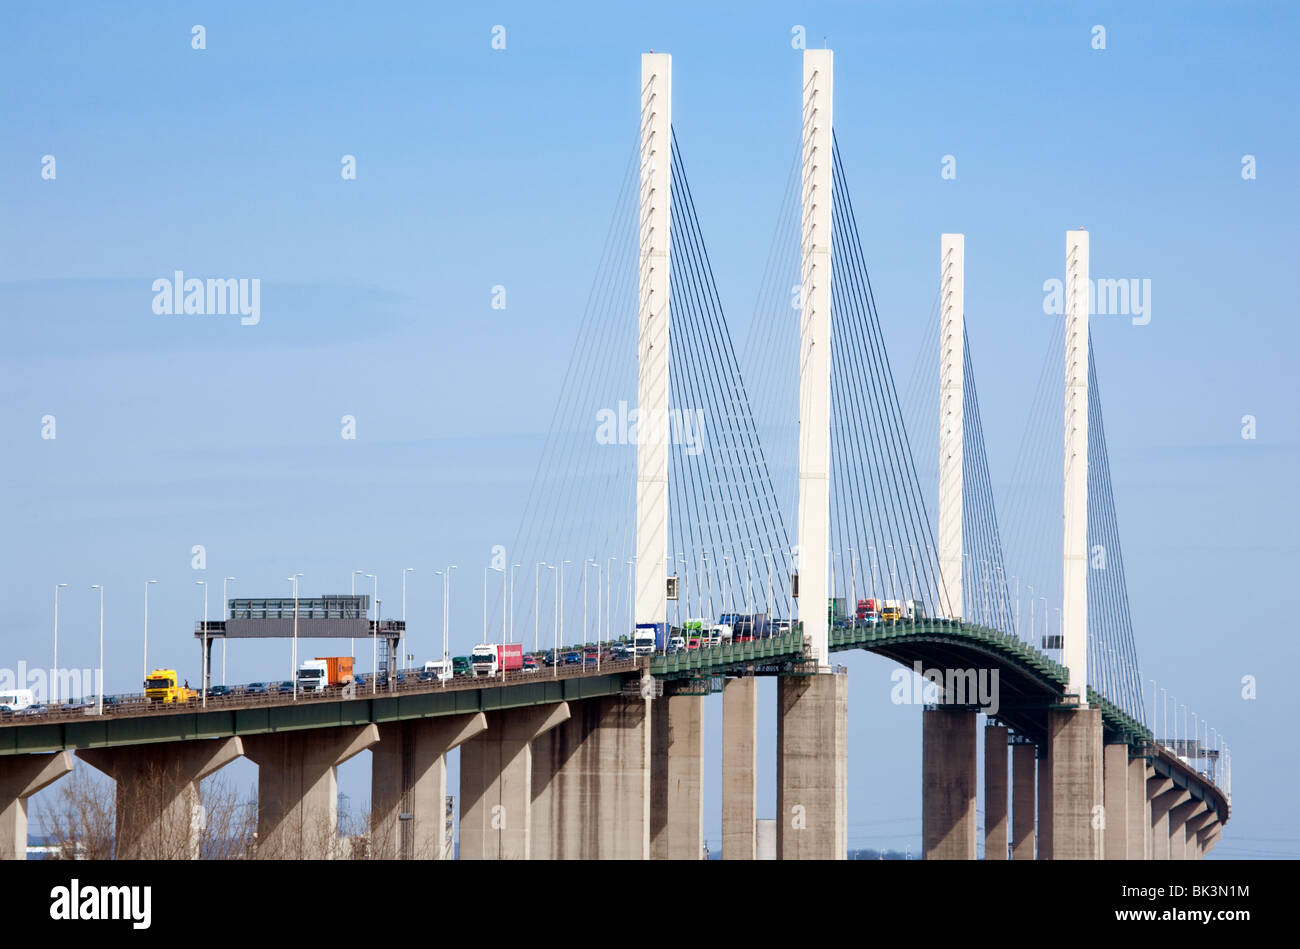 Queen Elizabeth 11 Suspension bridge, the Dartford Crossing, Dartford, Kent, UK - Stock Image